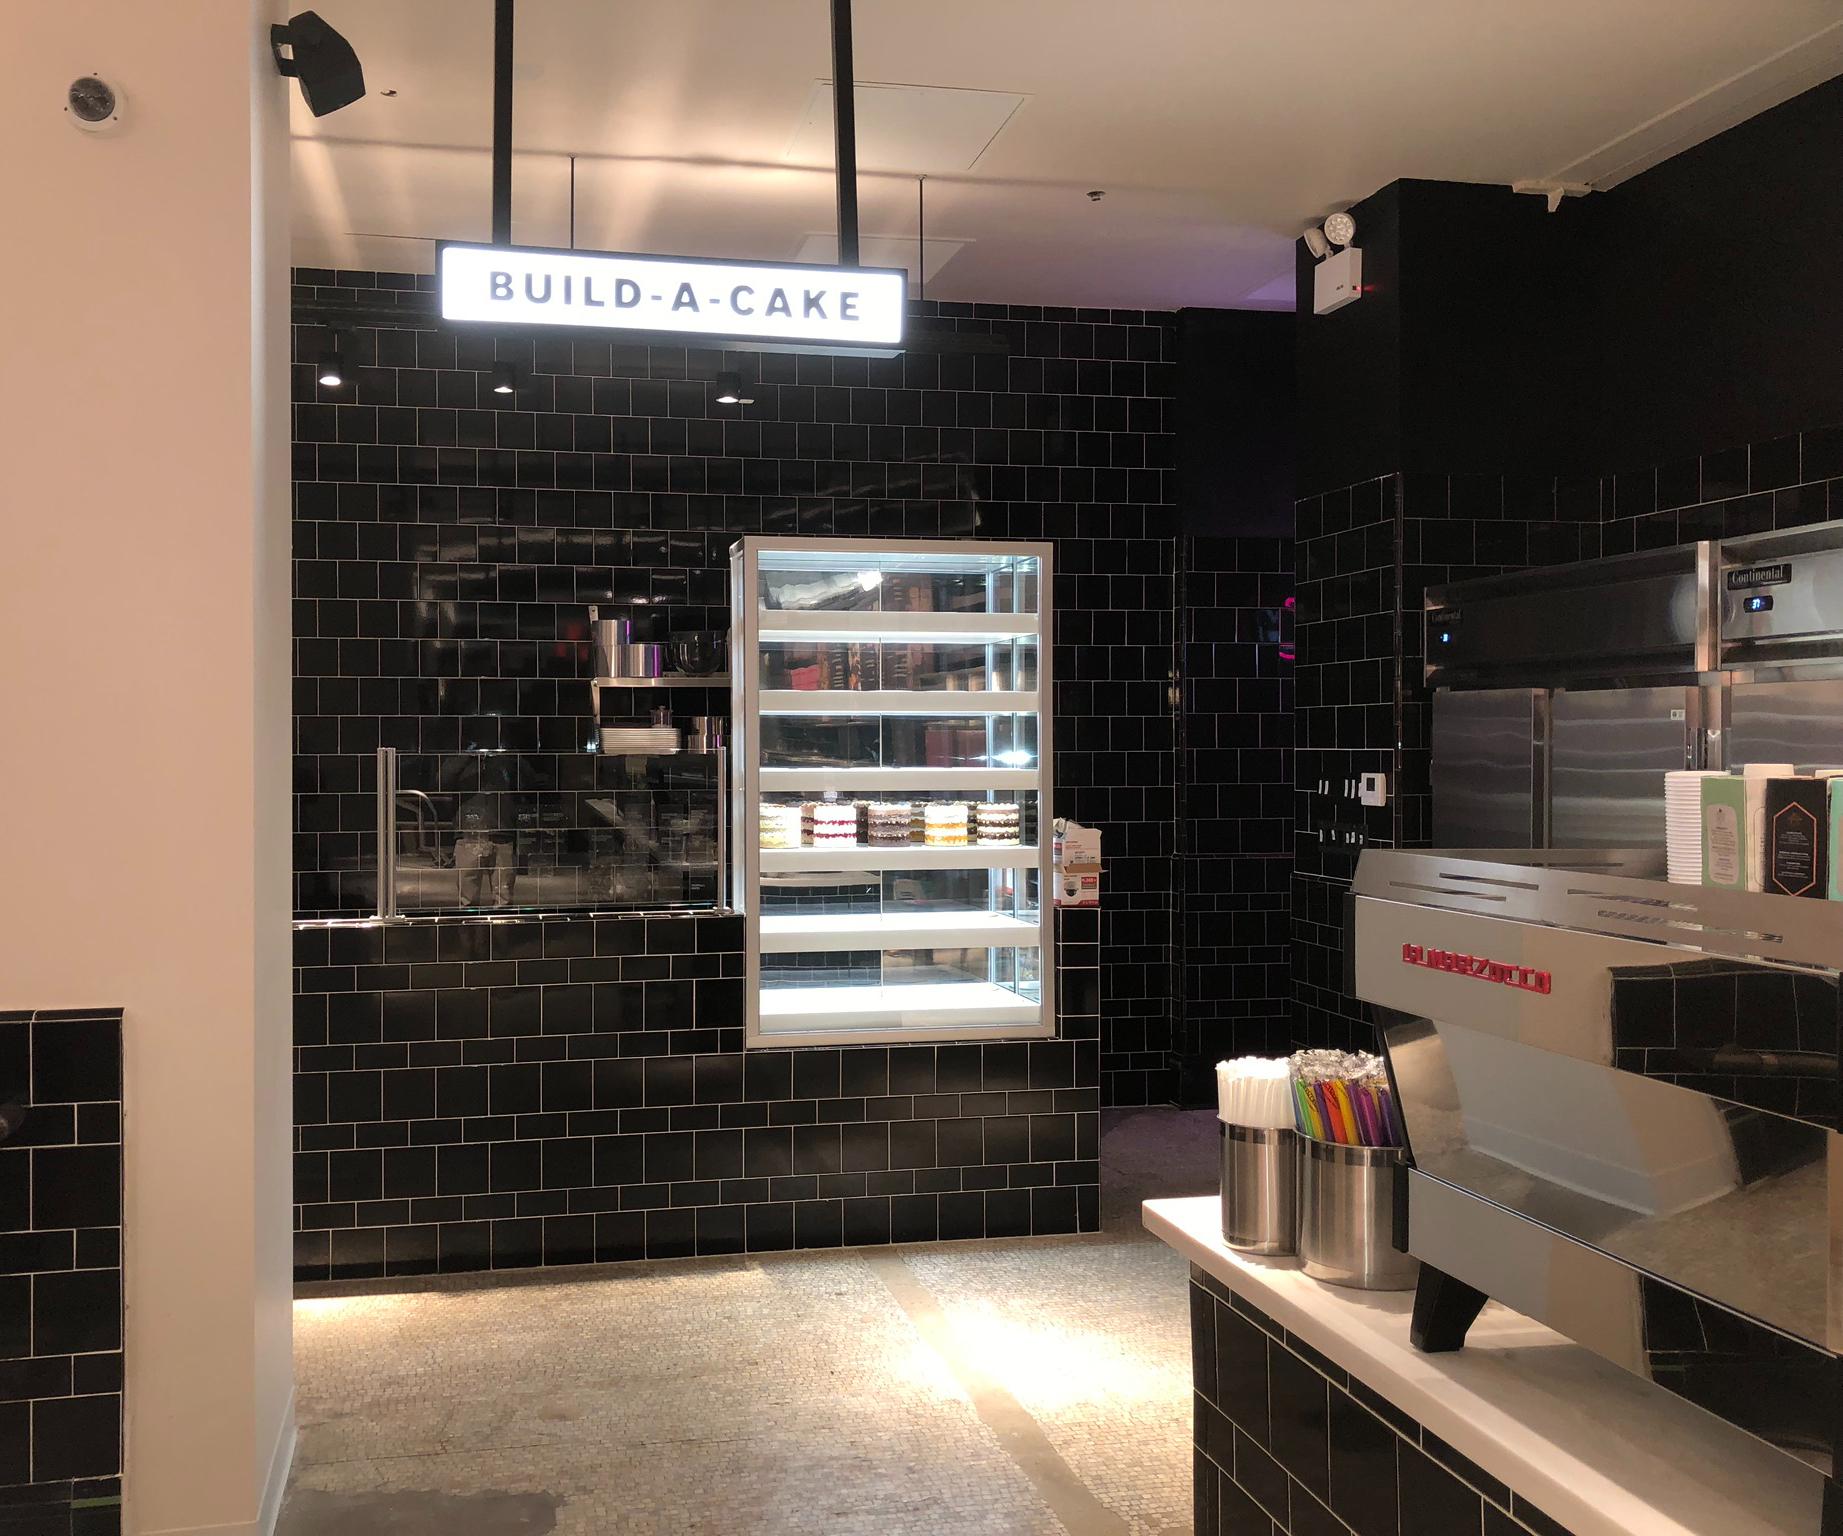 Build-A-Cake at Milk Bar New York City Flagship